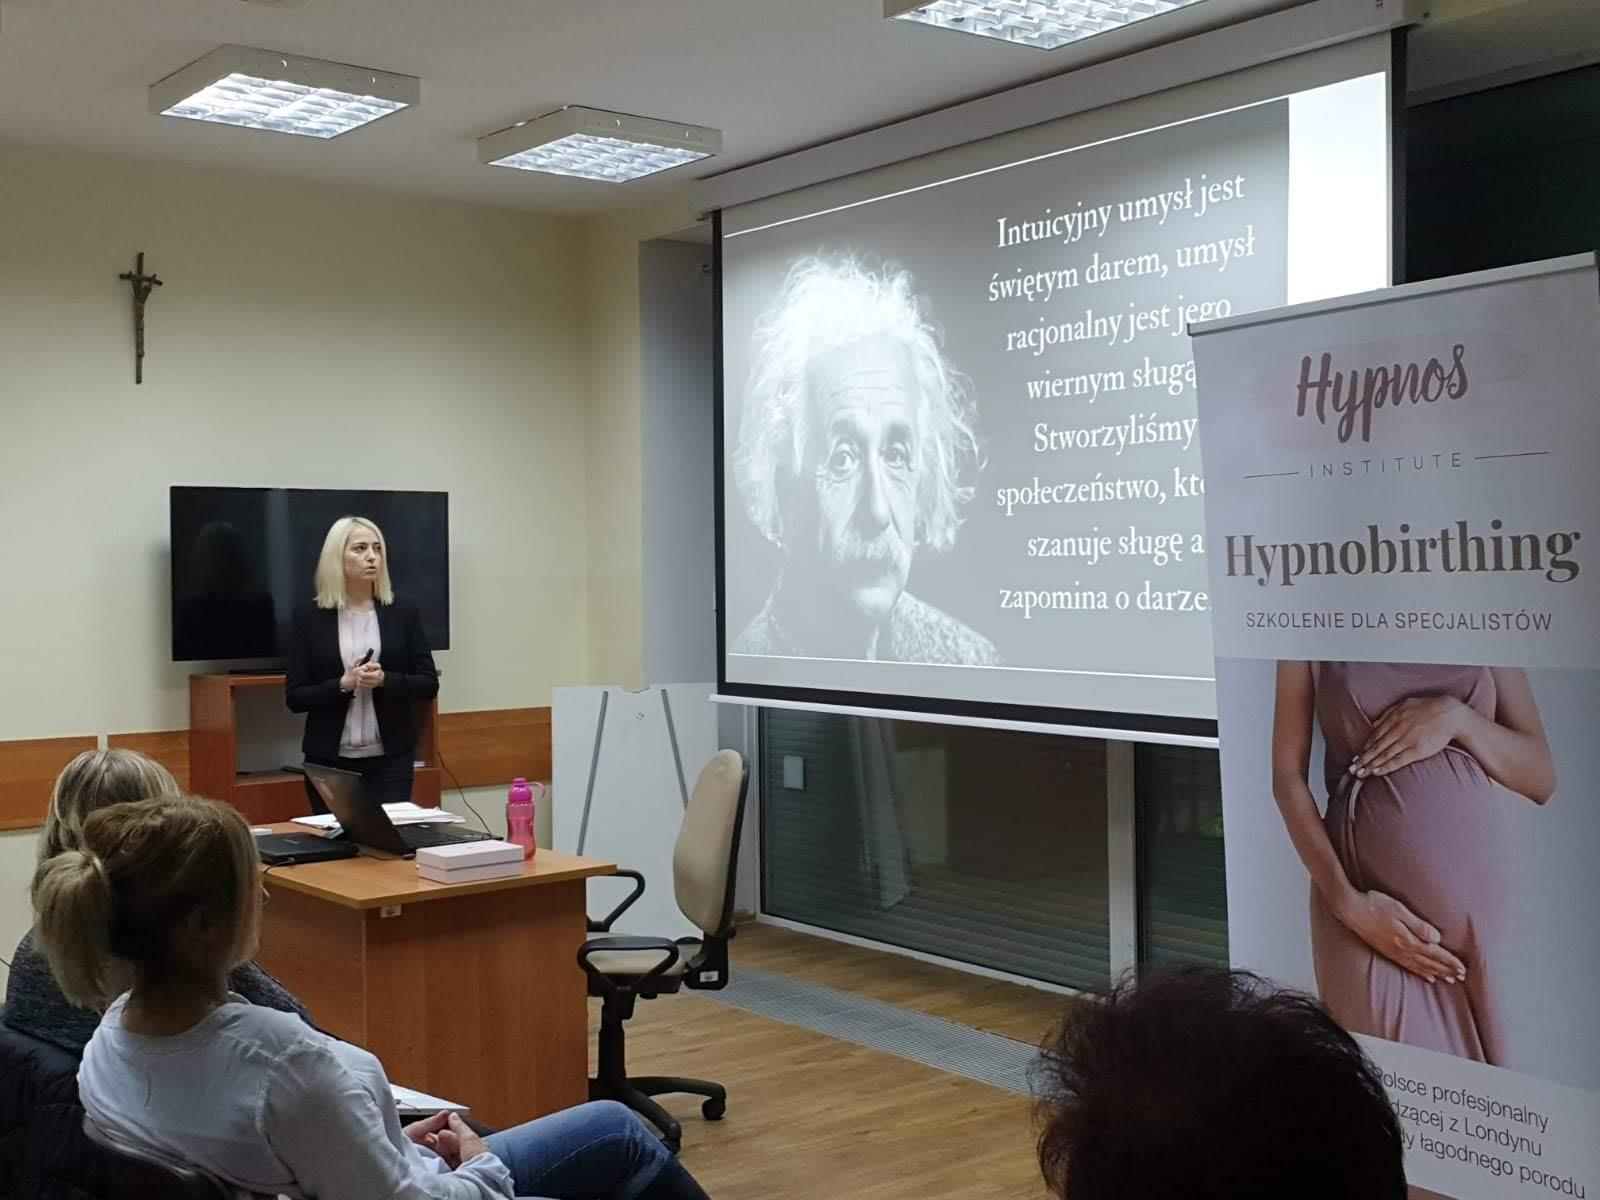 hipnorodzenie moipip